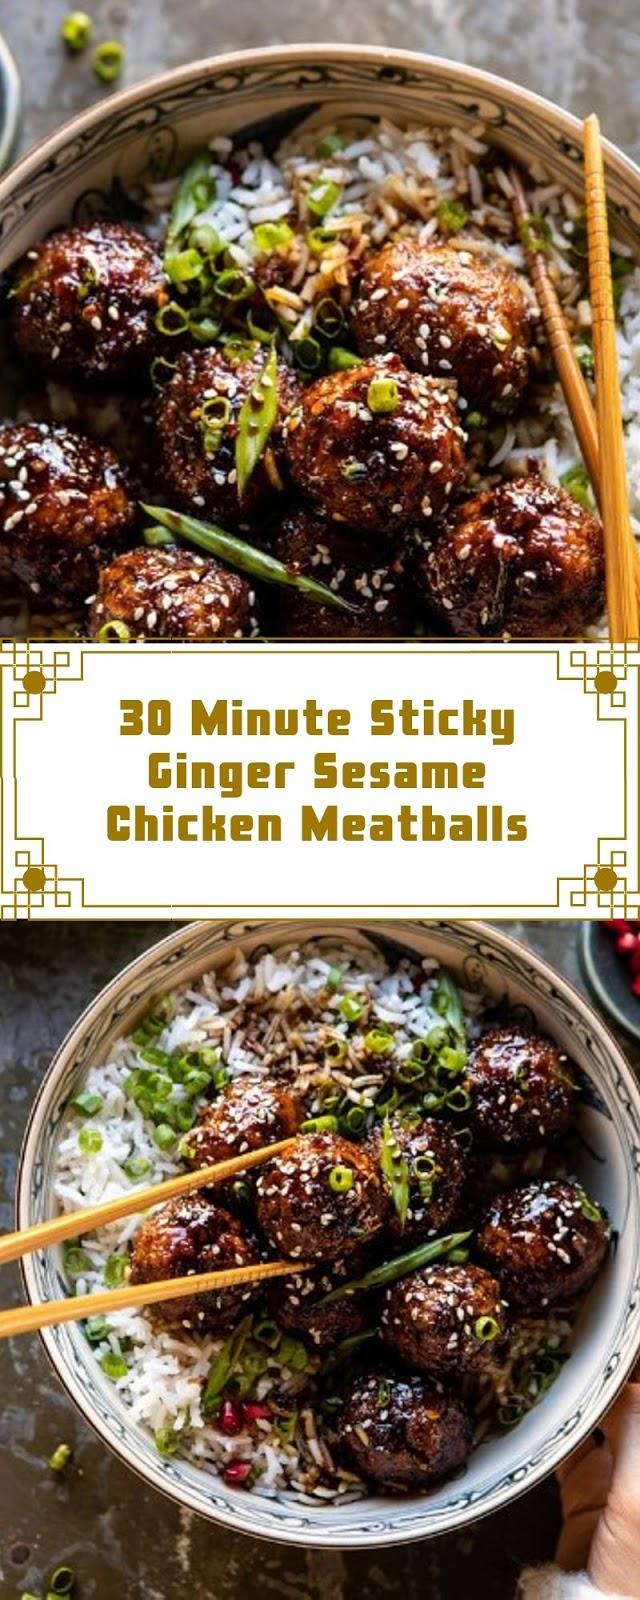 30 Minute Sticky Ginger Sesame Chicken Meatballs